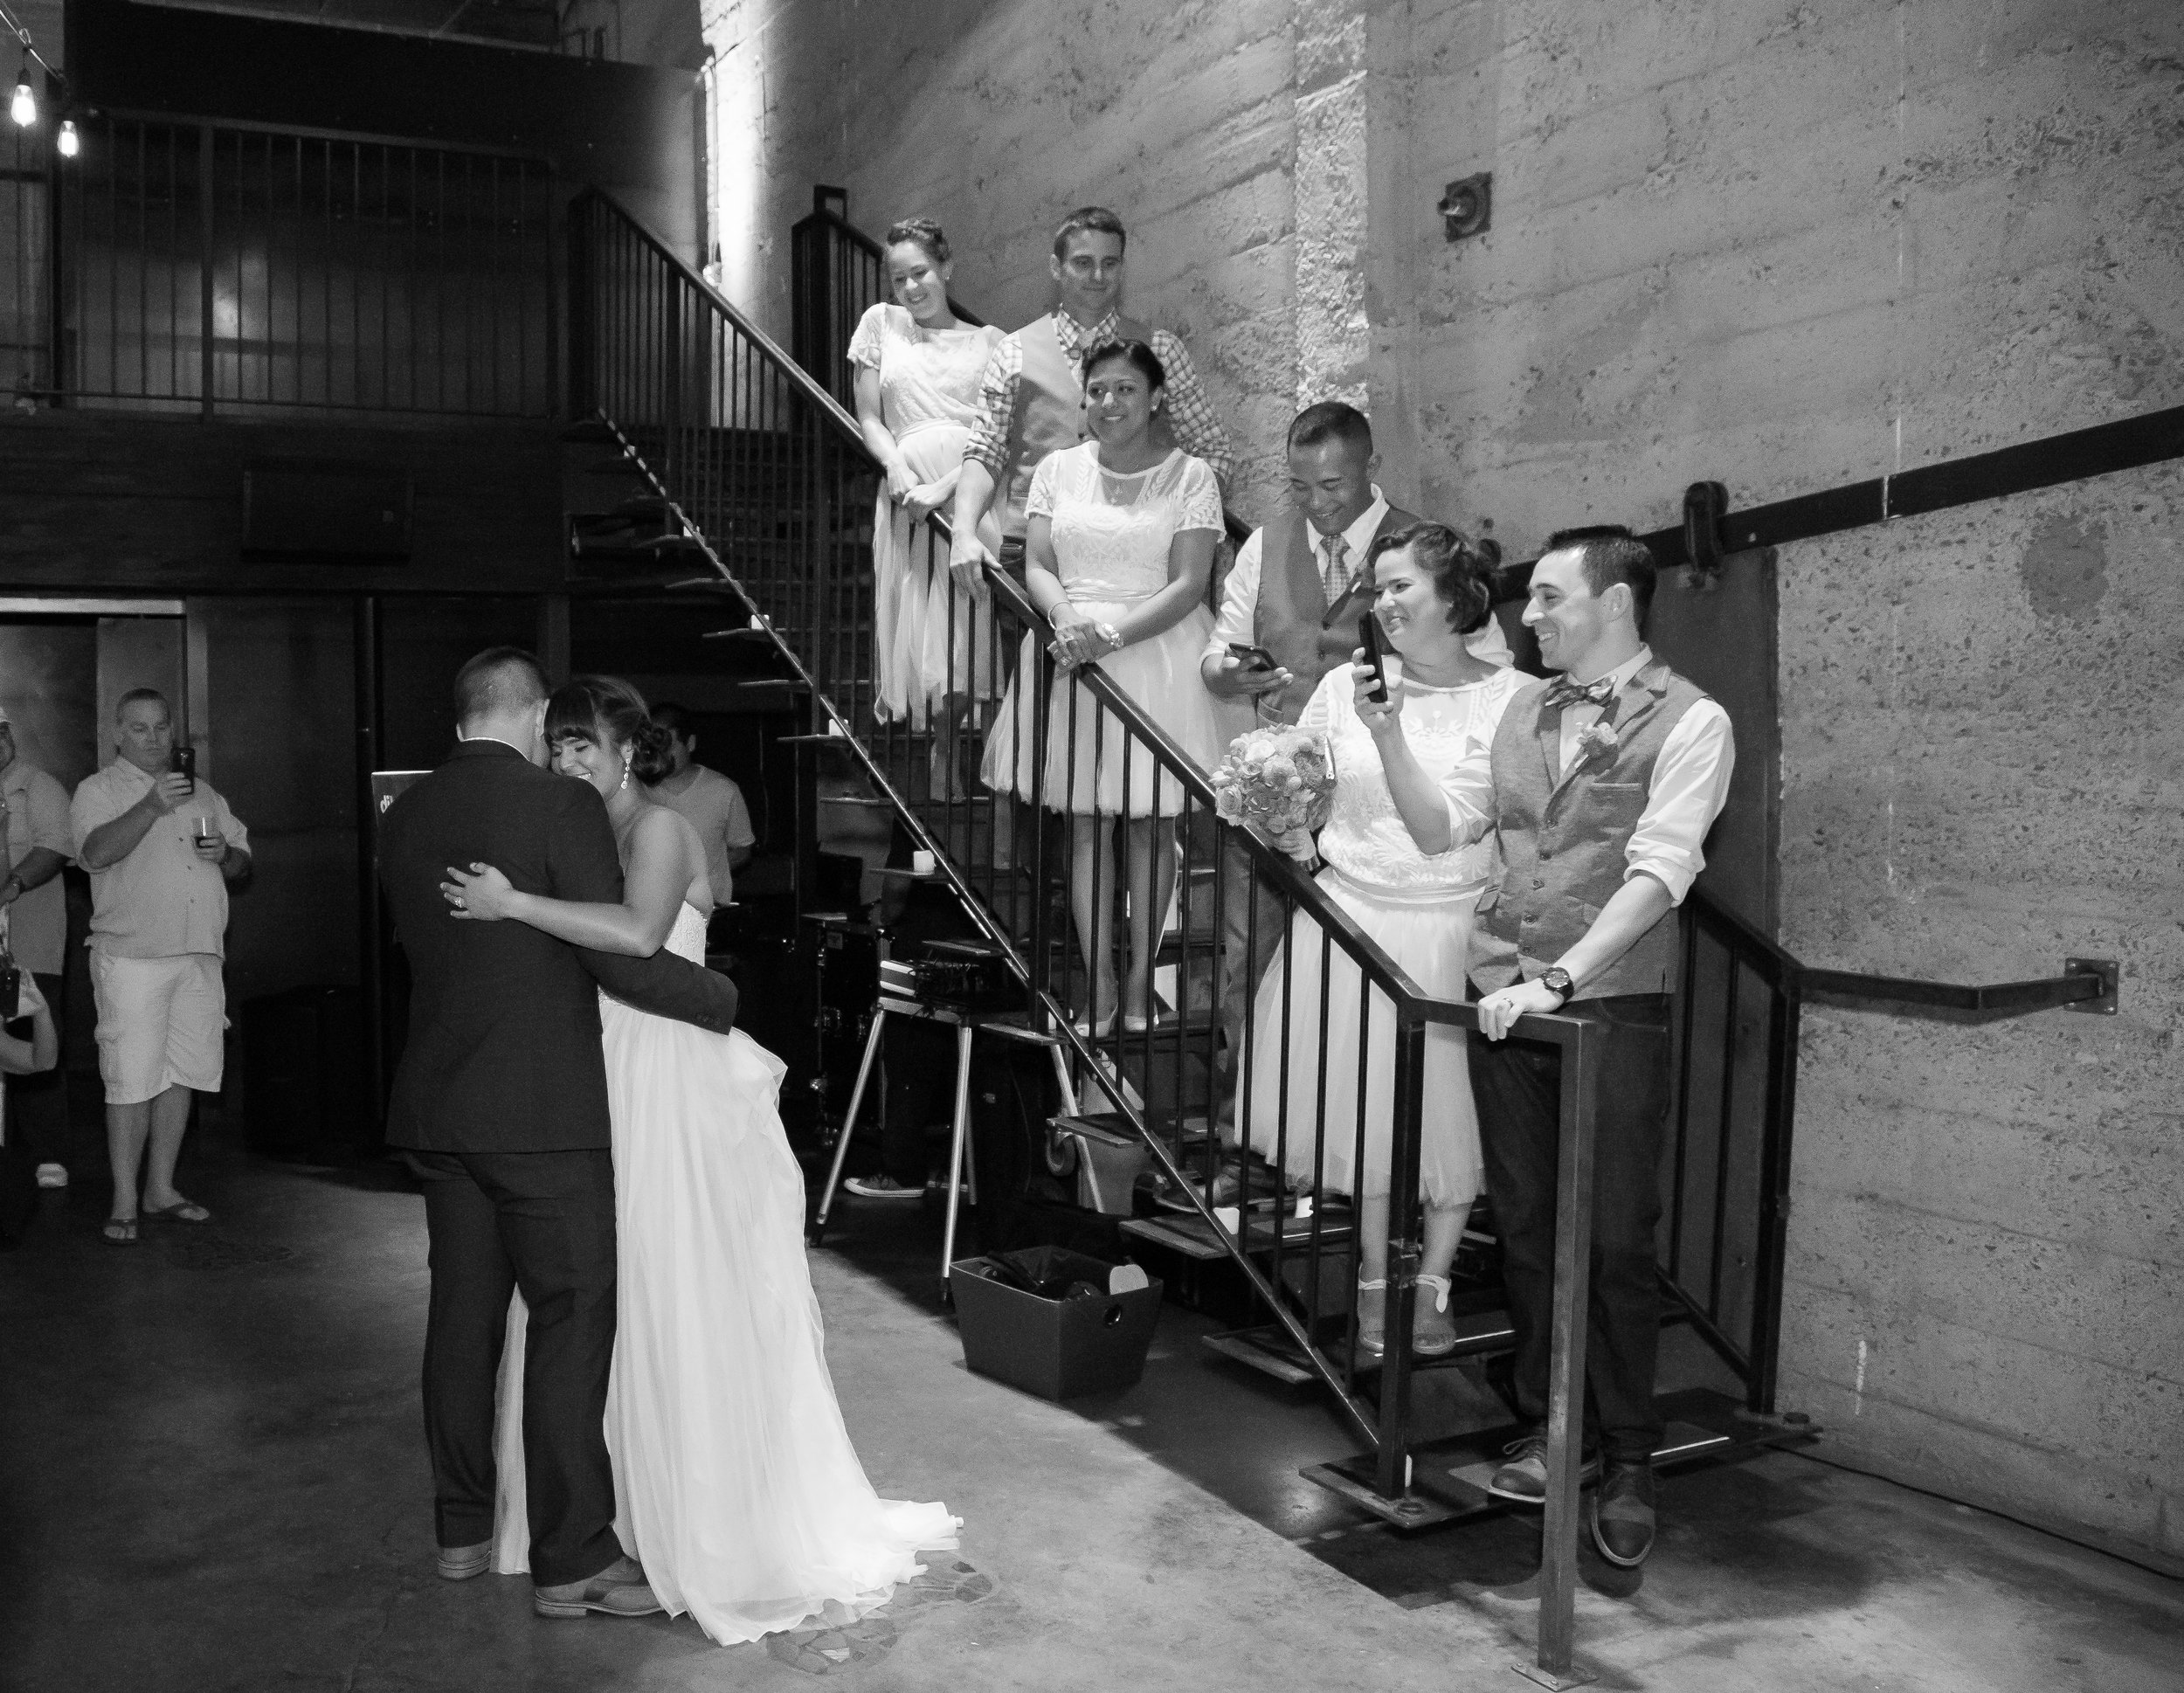 Erik and Melanie have their first dance as husband wife at their Luce Loft wedding.